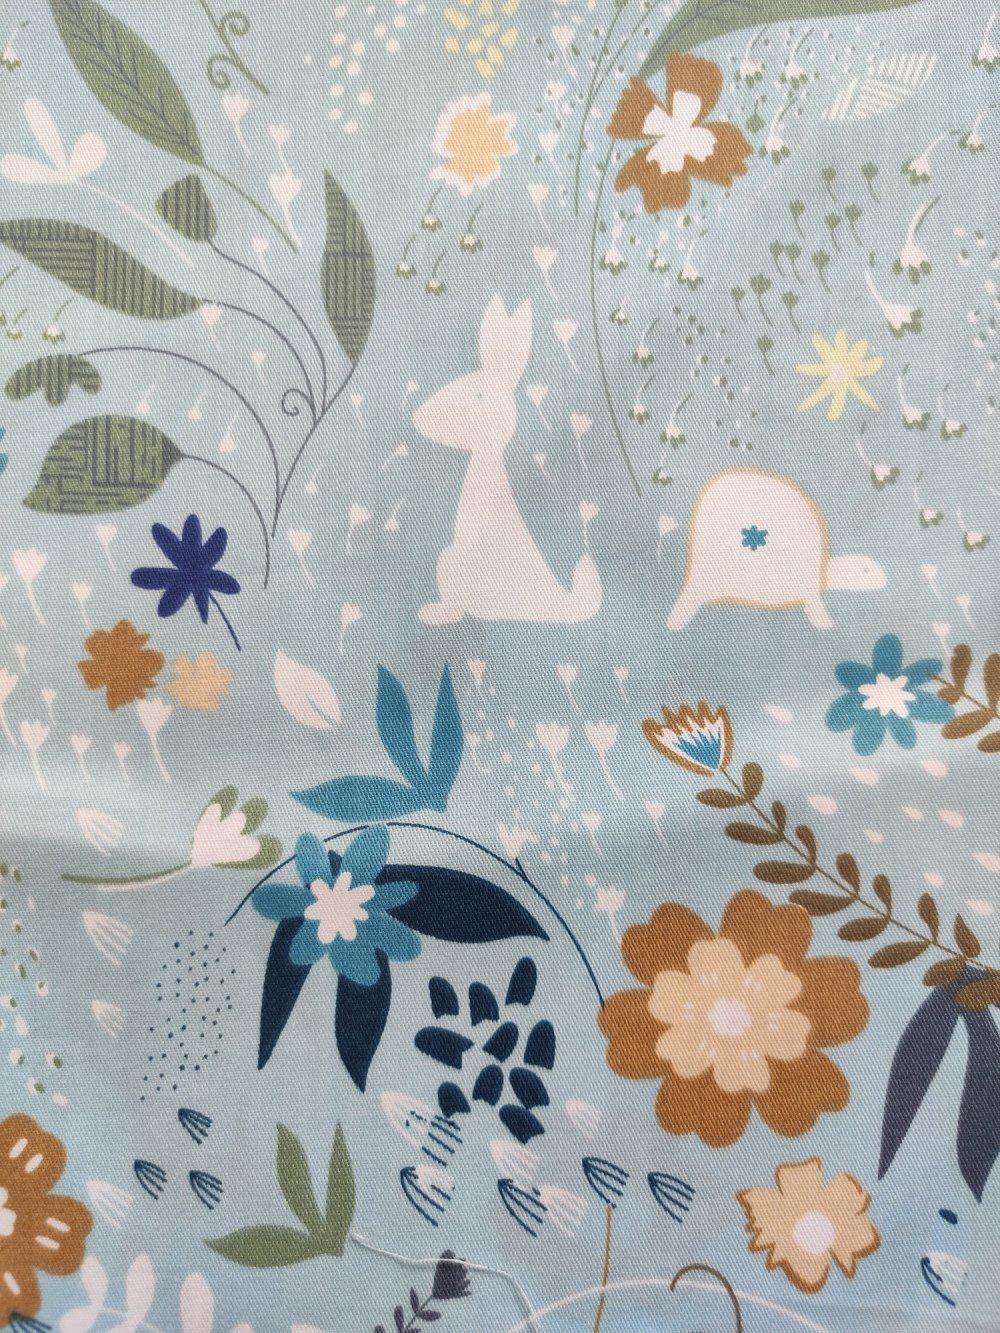 Coupon tissu - lapin champetre / shabby chic bleu - coton - 40x50cm